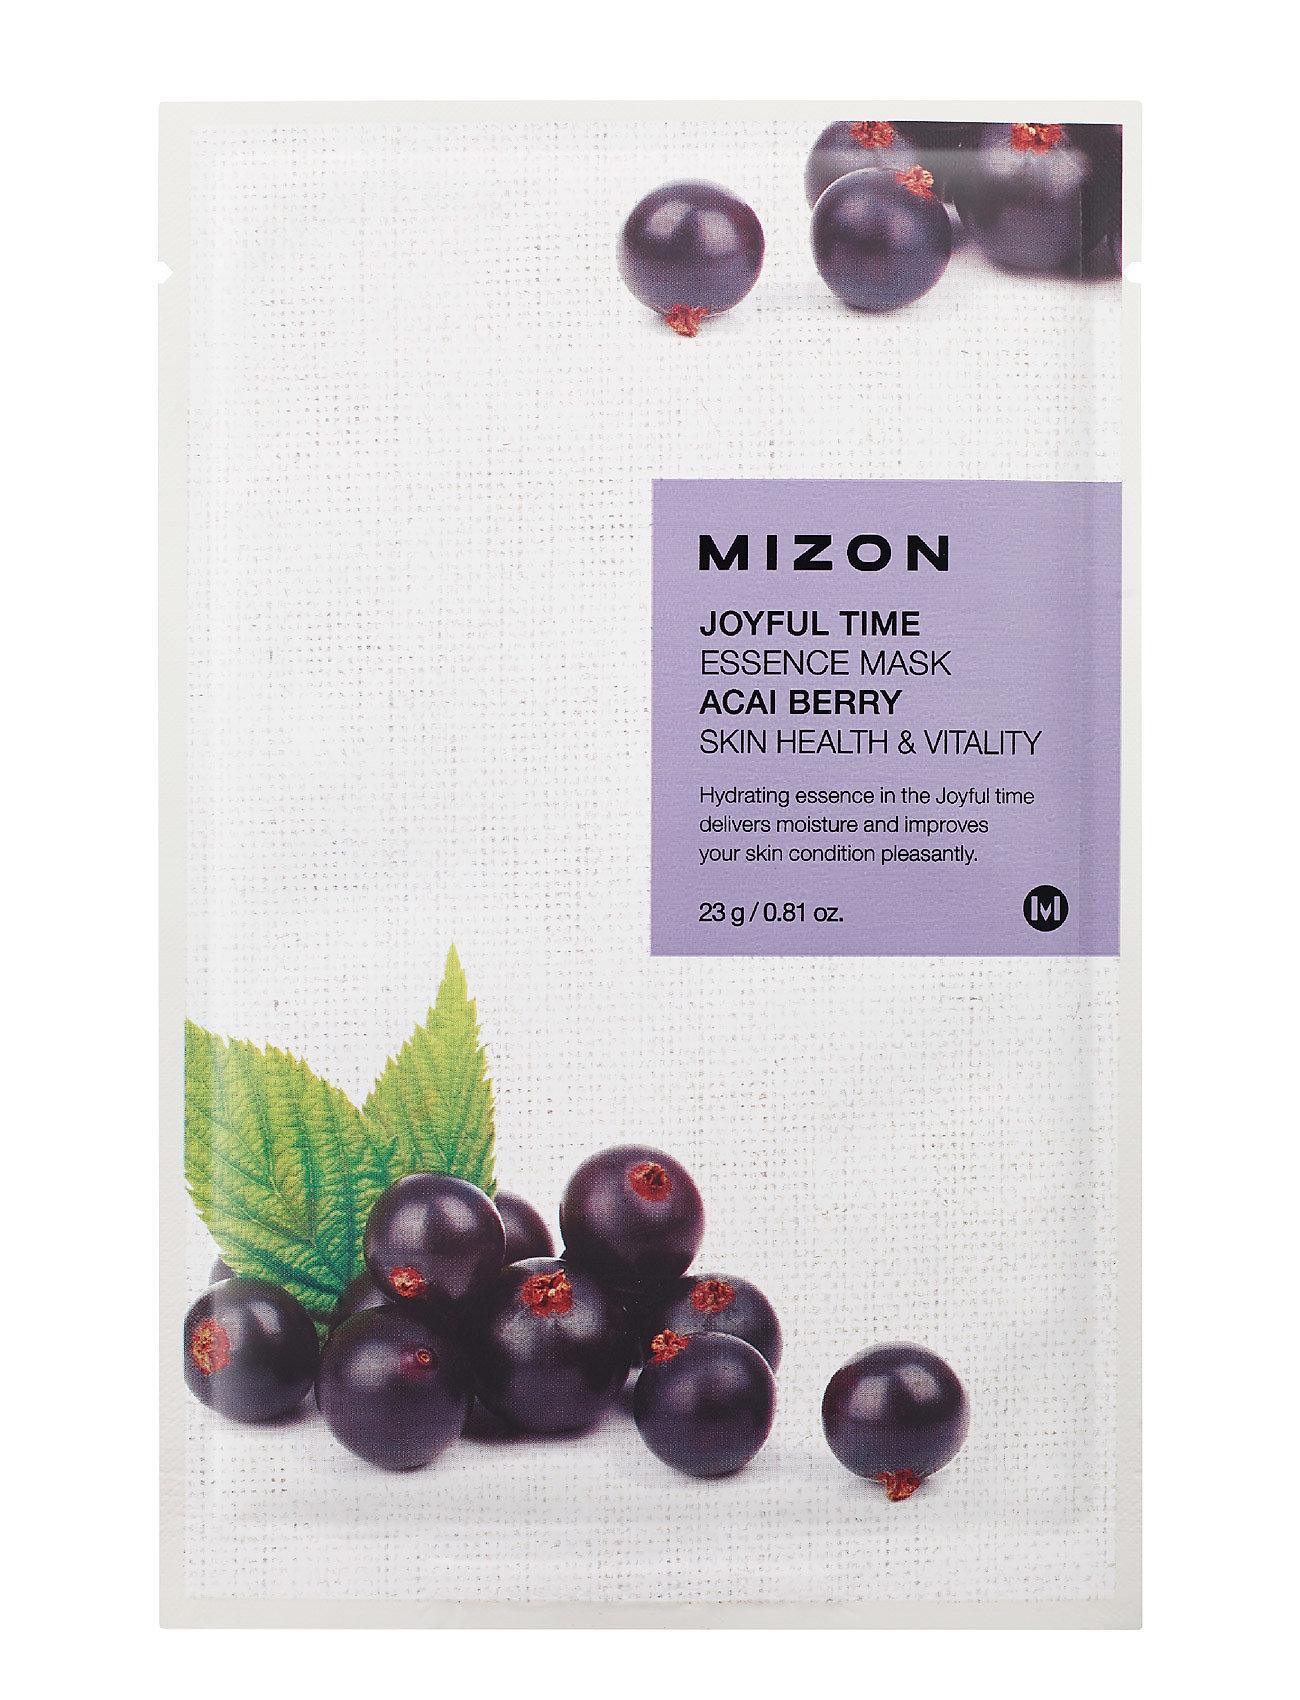 MIZON Joyful Time Mask Acai Berry - CLEAR